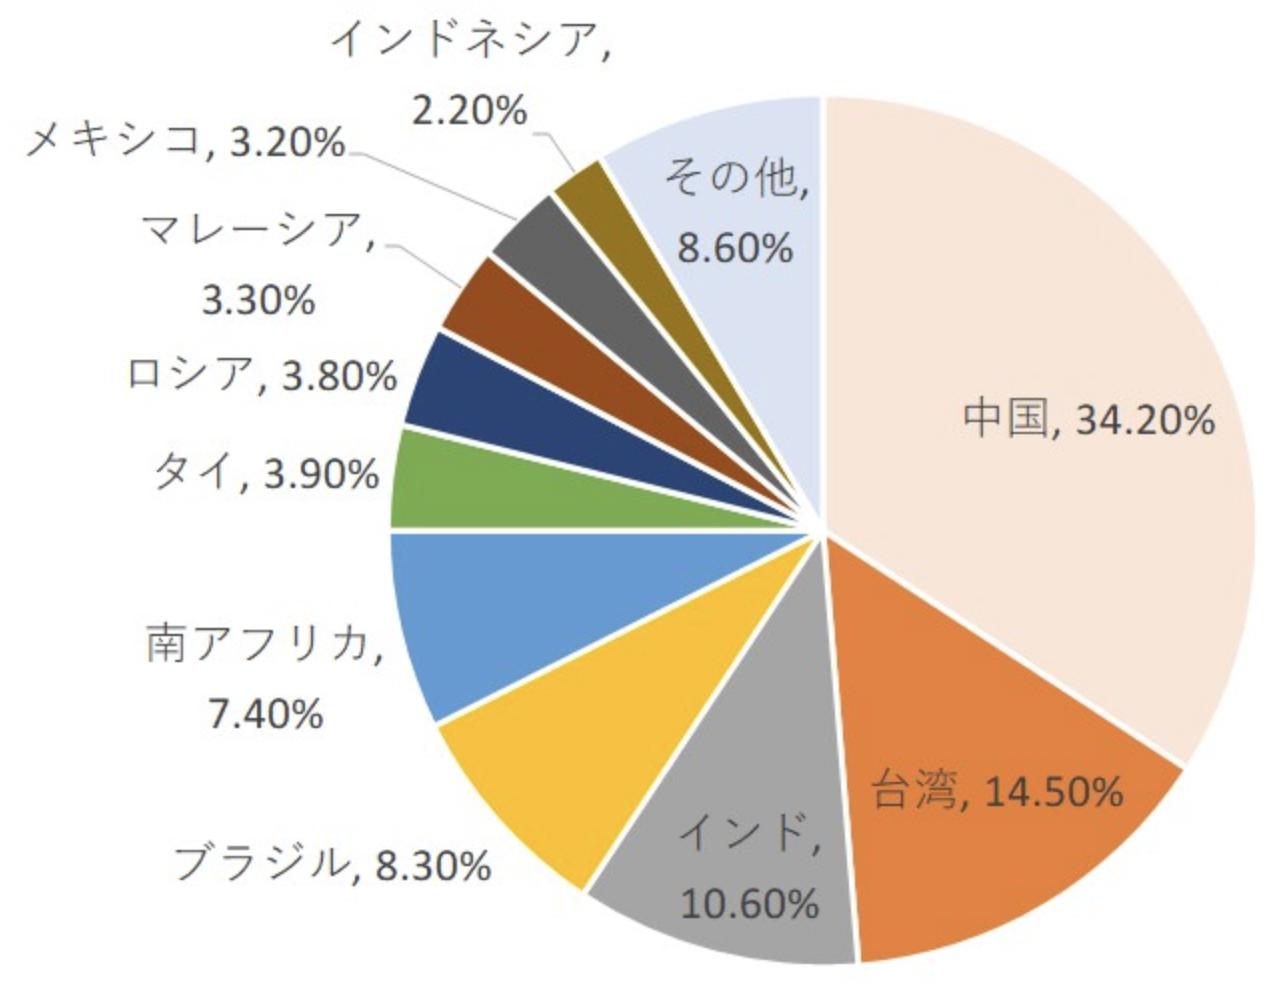 VWOの国別構成比